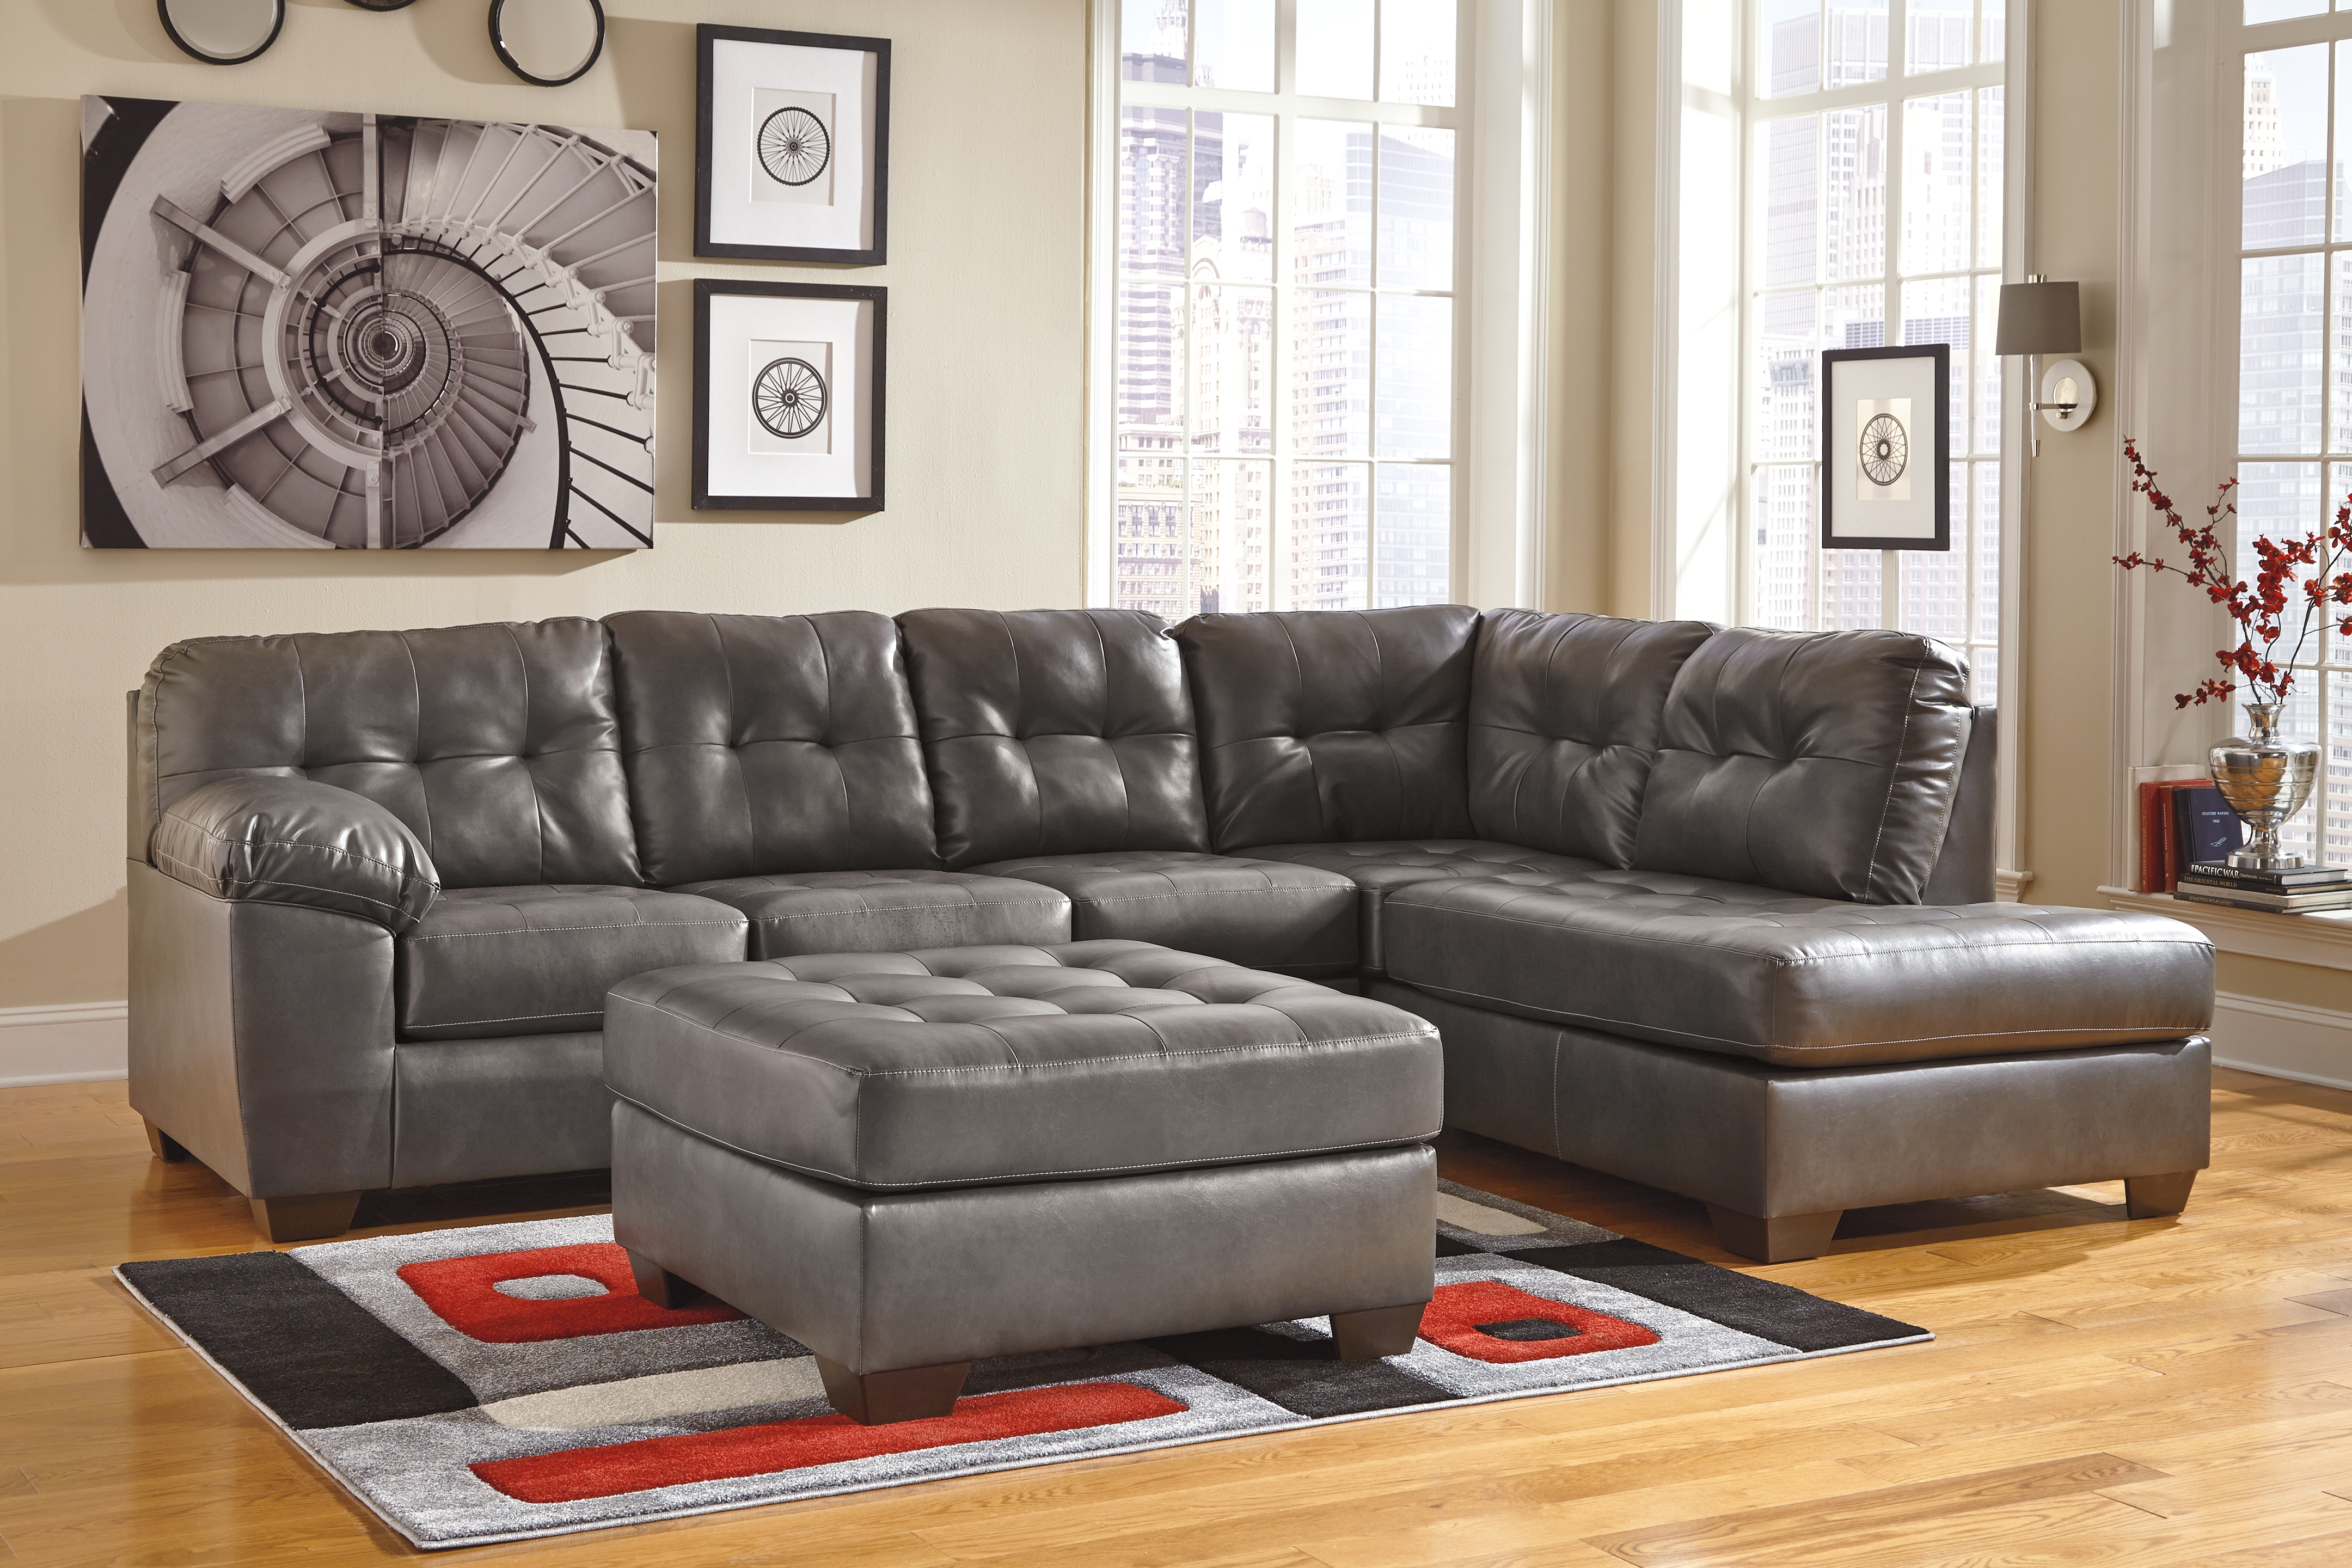 Alliston Ottoman By Signature Design By Ashley 2010208 Missouri Furniture